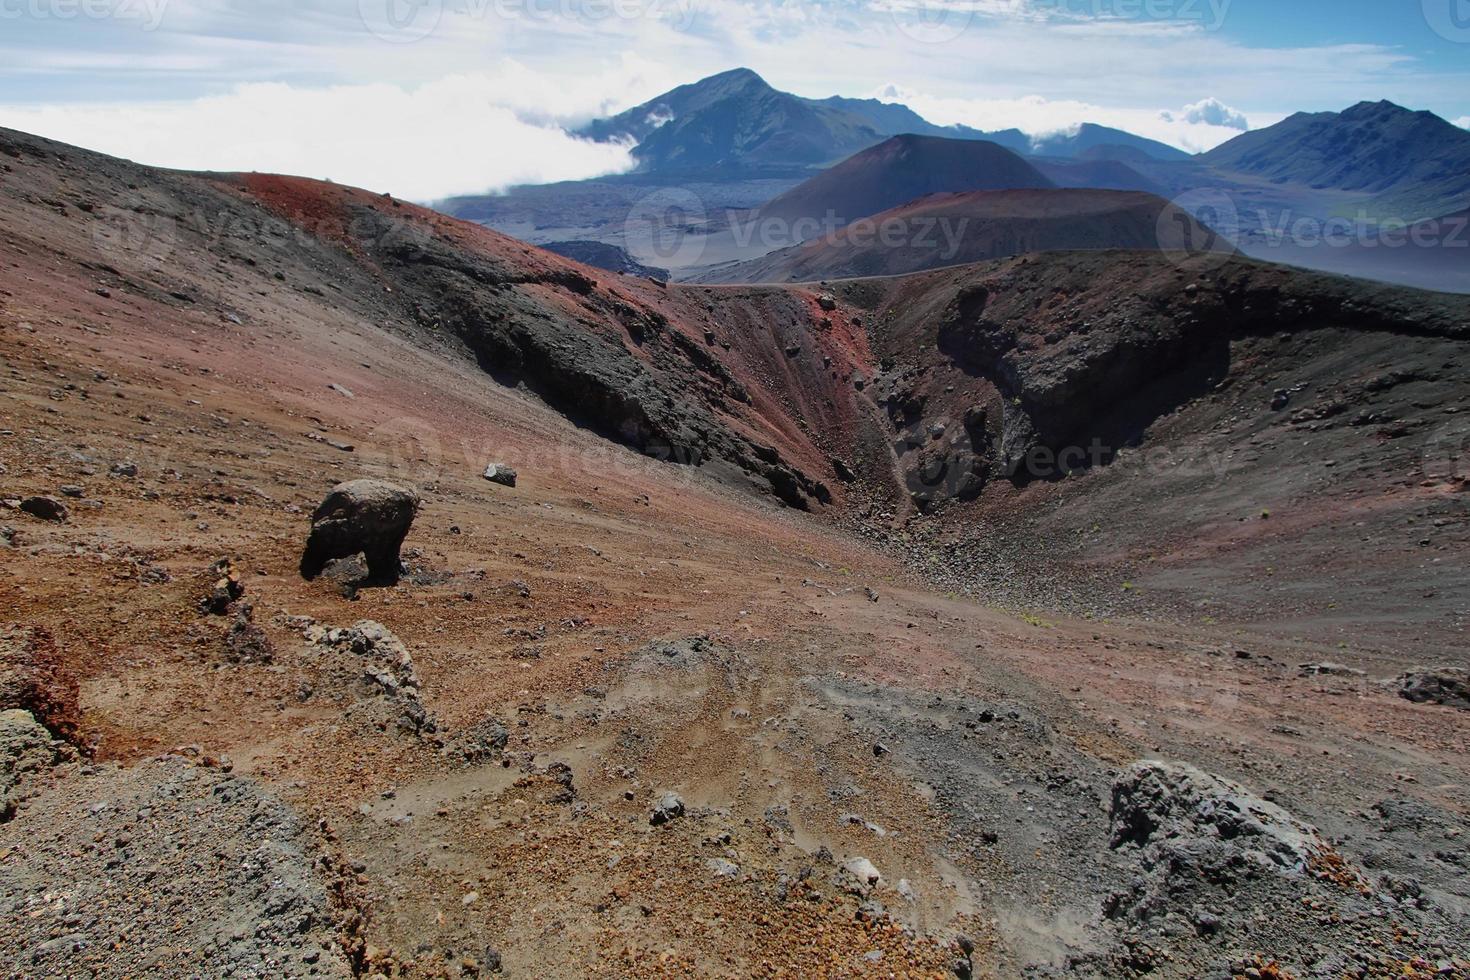 Caldera des Vulkans Haleakala auf der Insel Maui foto